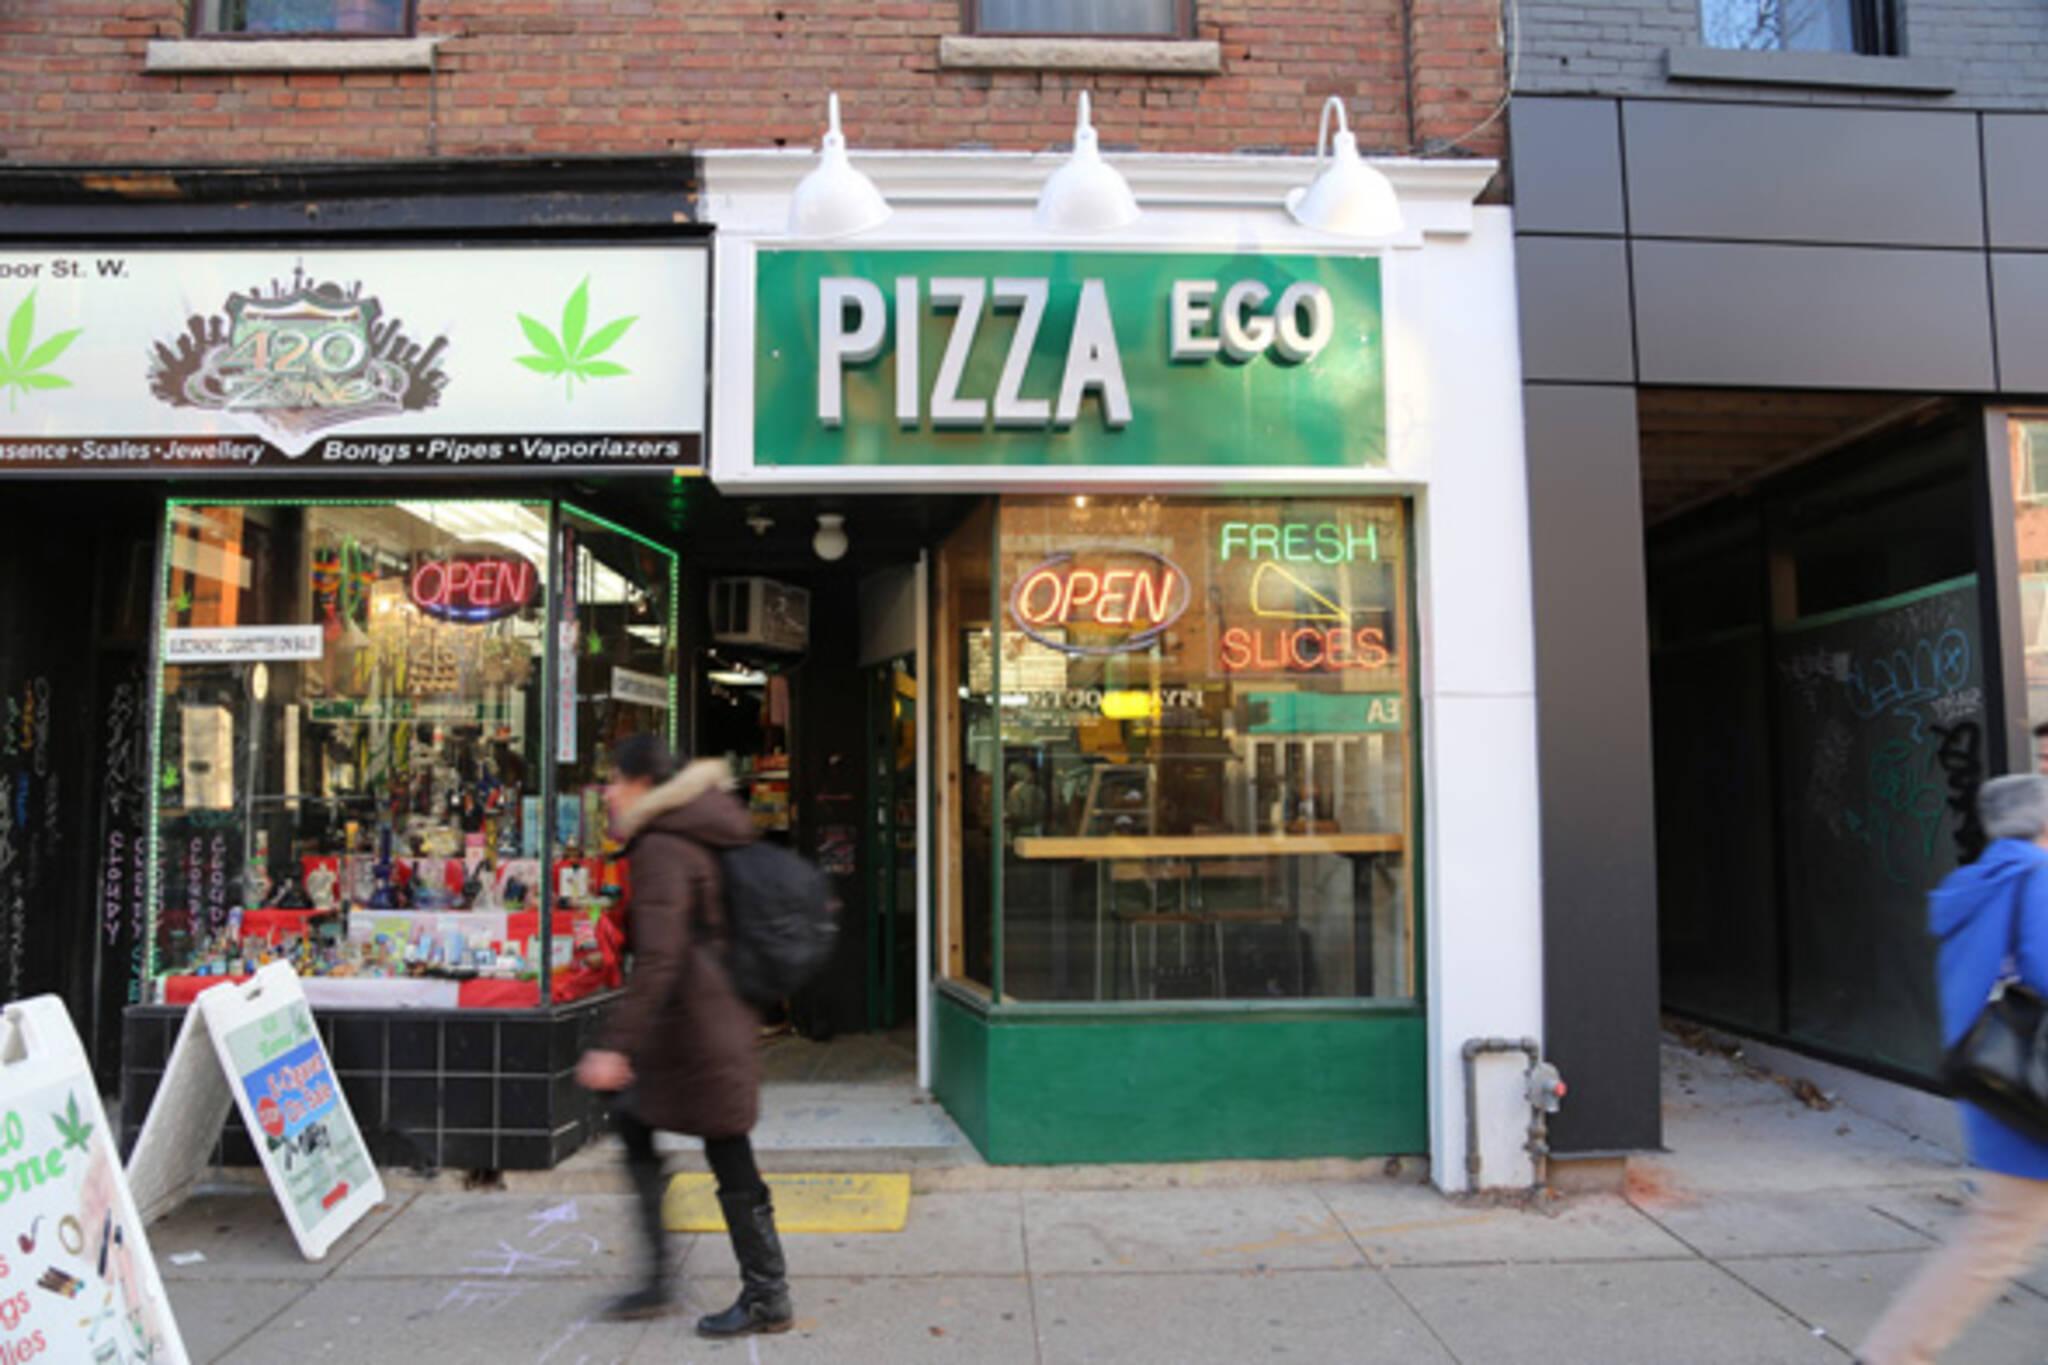 pizza ego